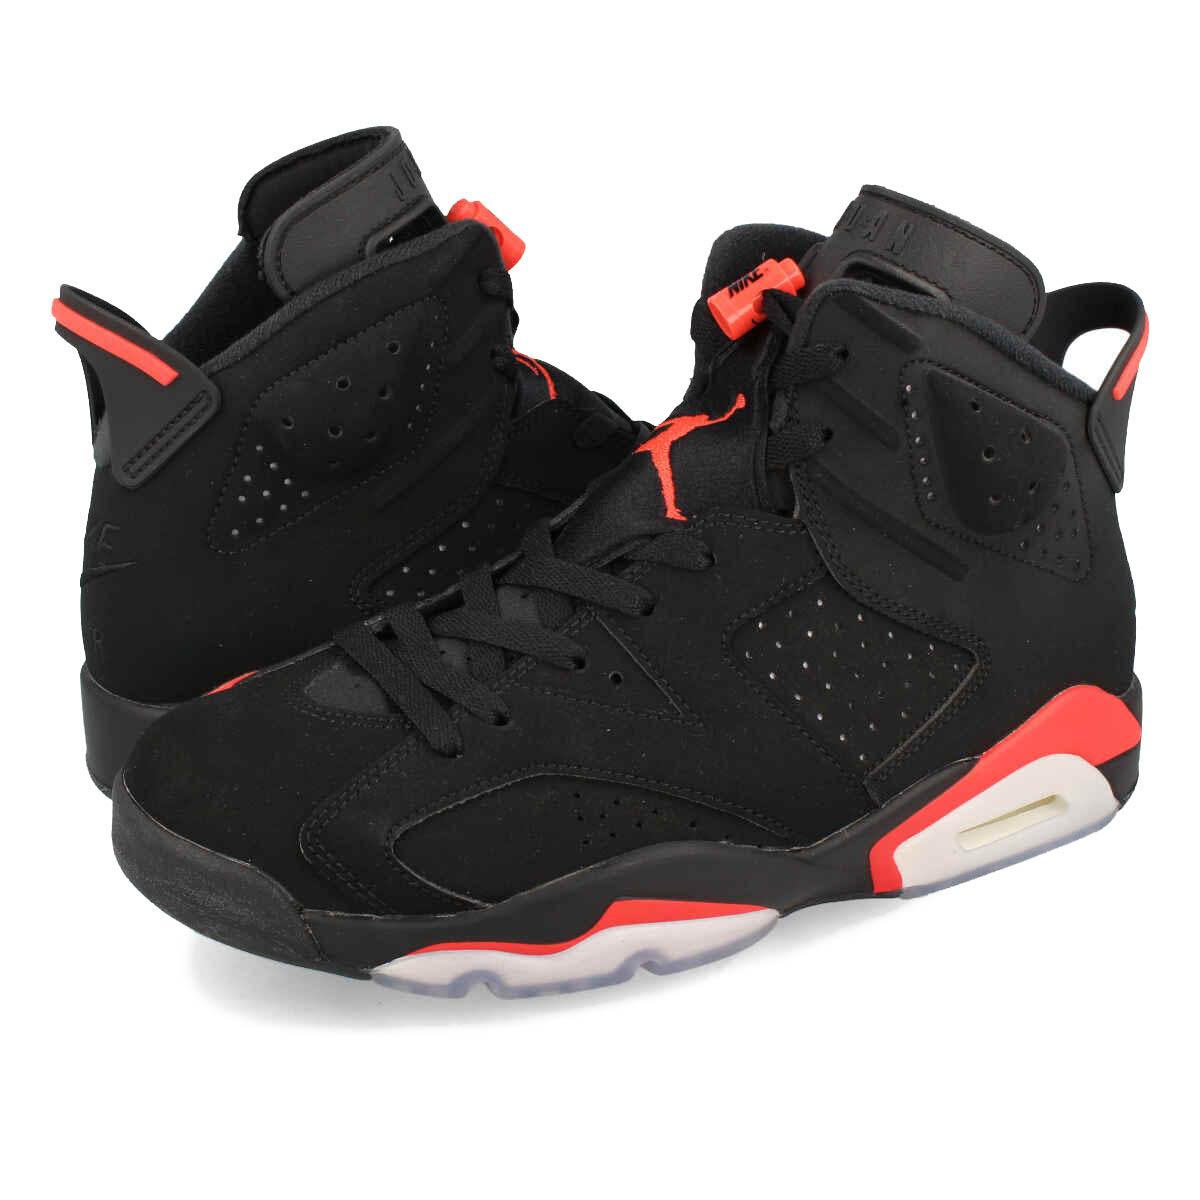 9b10555db66 NIKE AIR JORDAN 6 RETRO Nike Air Jordan 6 nostalgic BLACK/INFRARED  384,664-060 ...